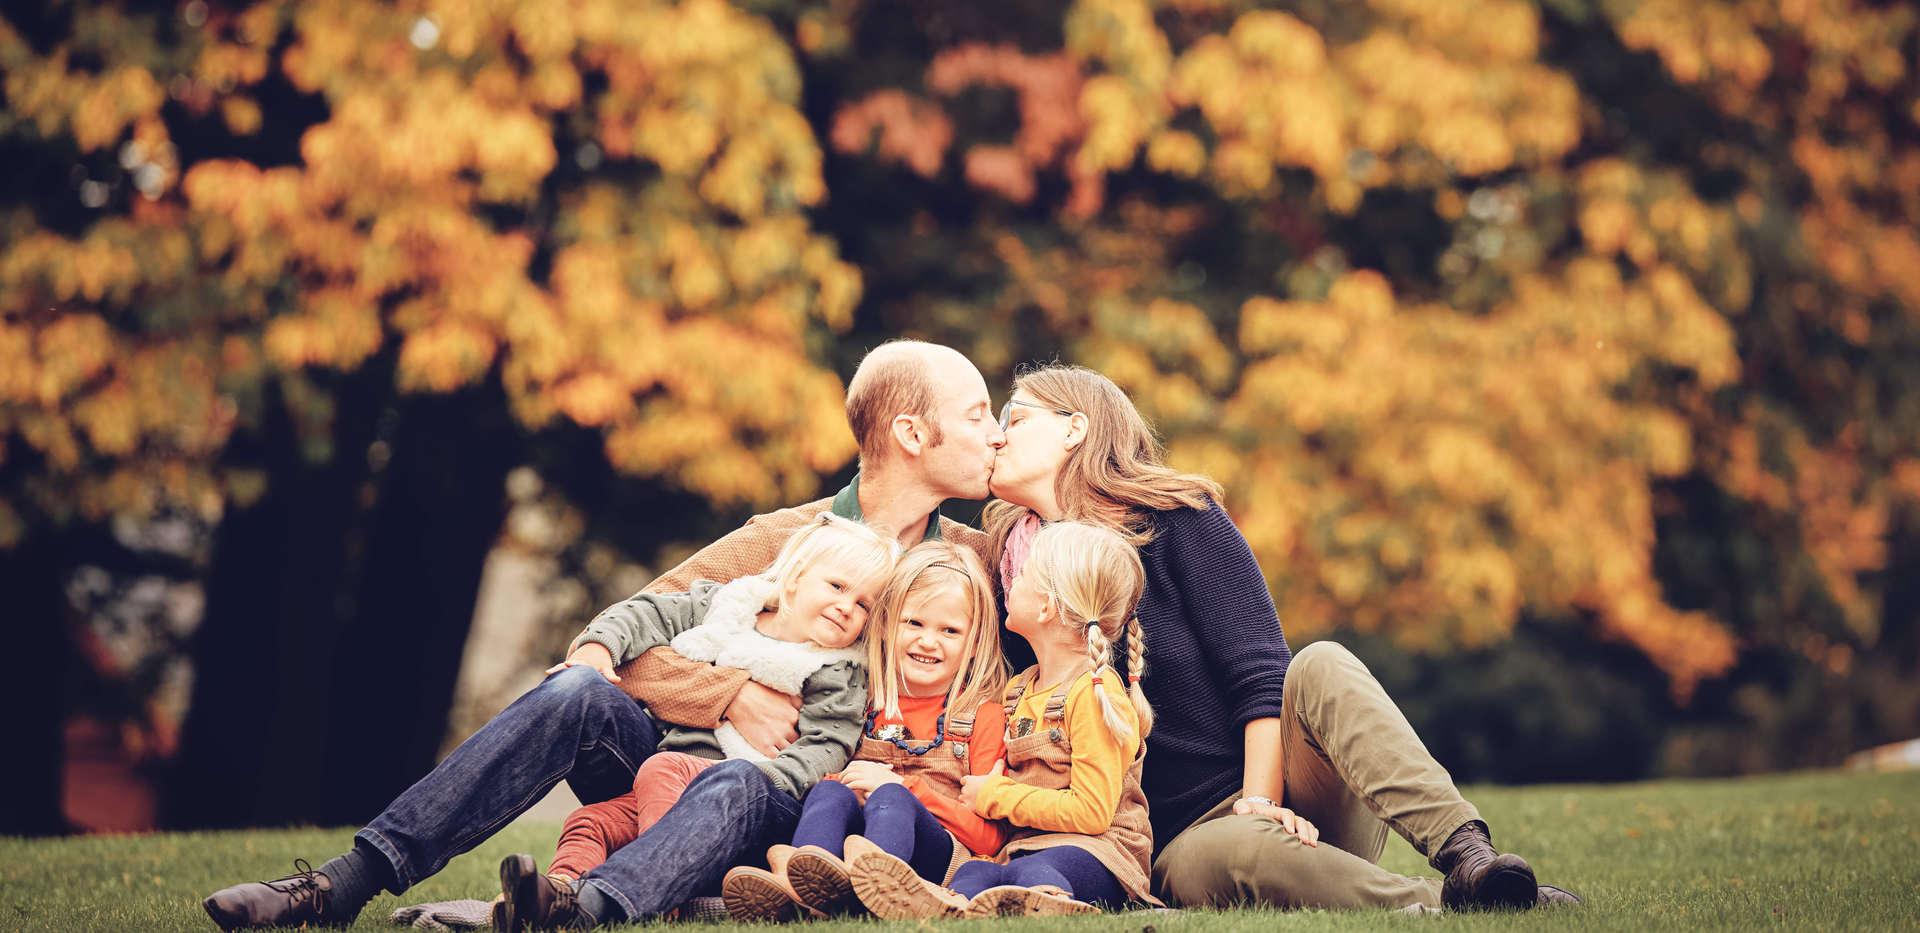 Herbst Familienfotoshooting-Familienfotograf-luzern